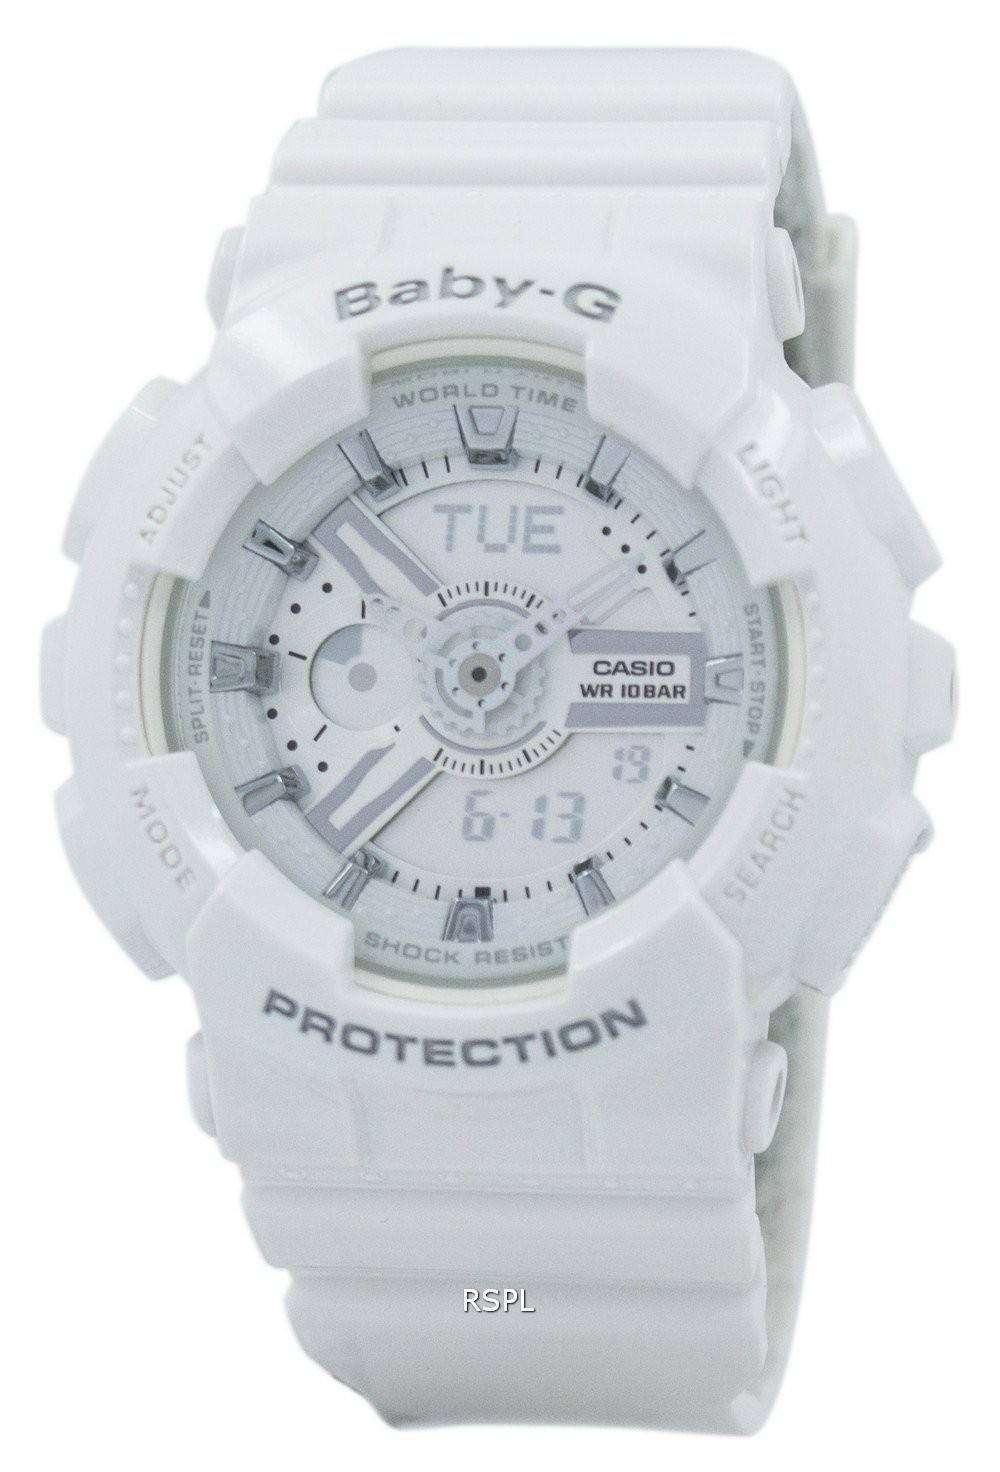 b6866179230b Casio Baby-G Analog Digital BA-110-7A3 Womens Watch - CityWatches.co.uk